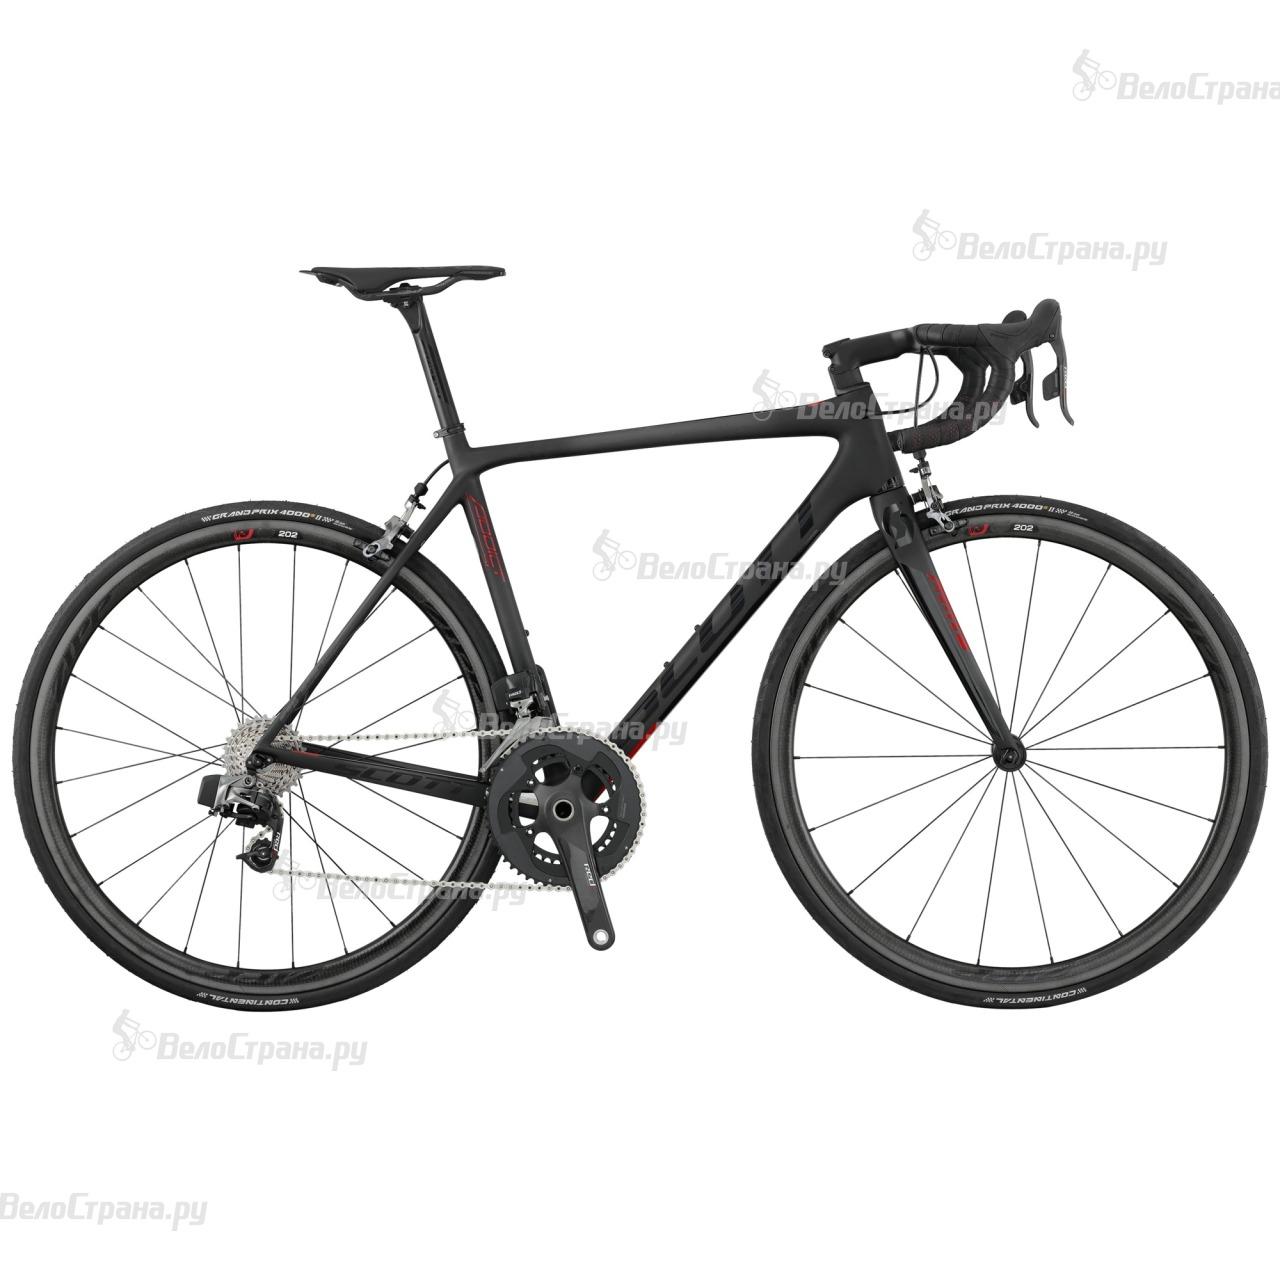 Велосипед Scott Addict SL (2017) scott addict sl compact 2015